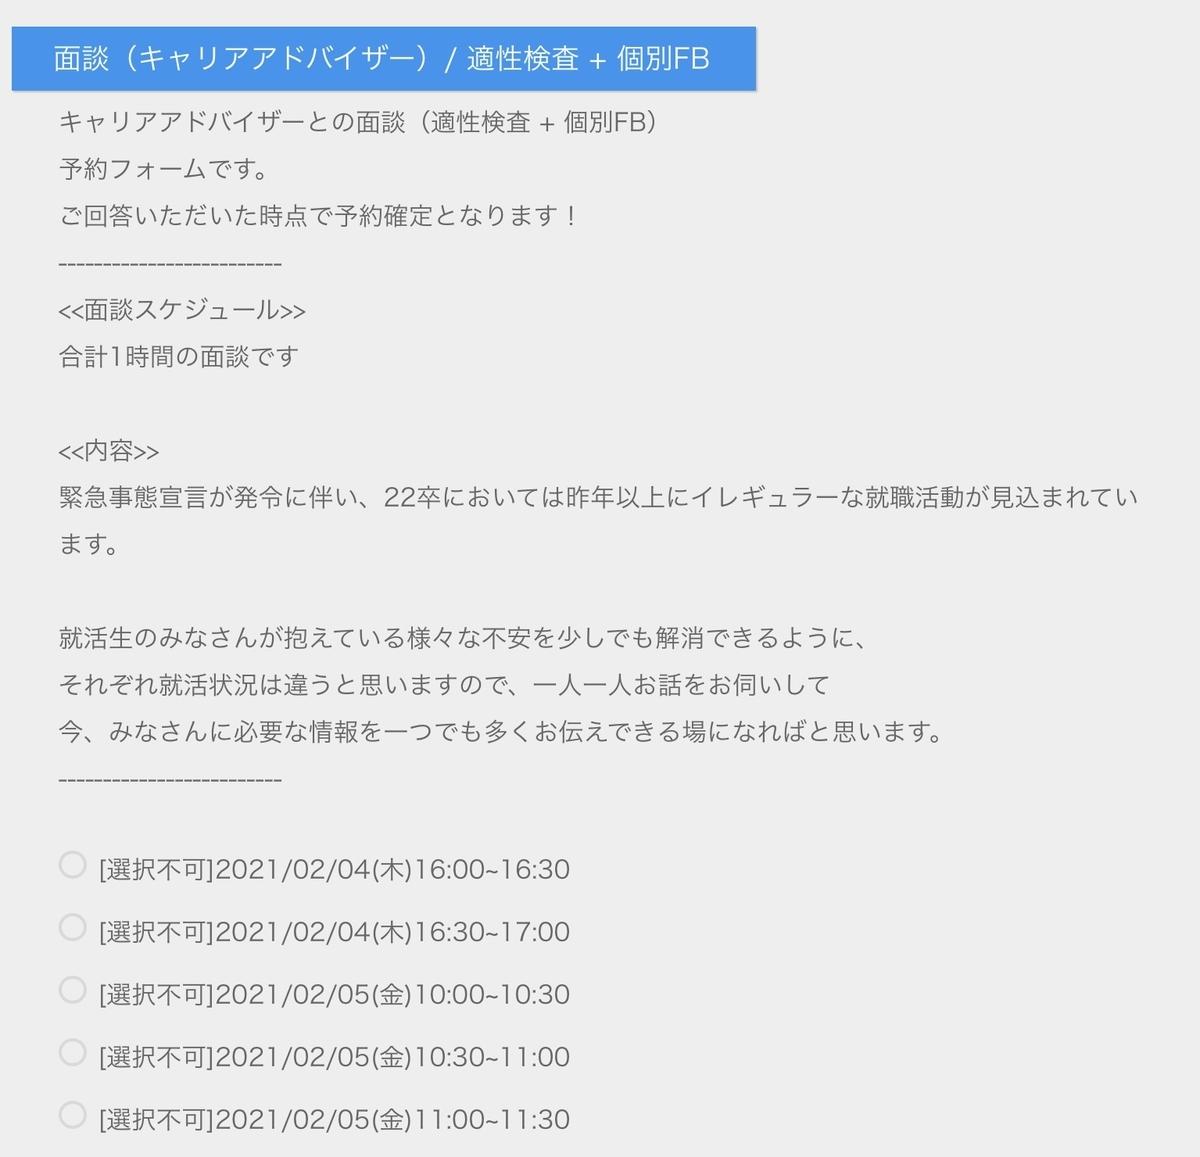 f:id:aibolic:20210207220356j:plain